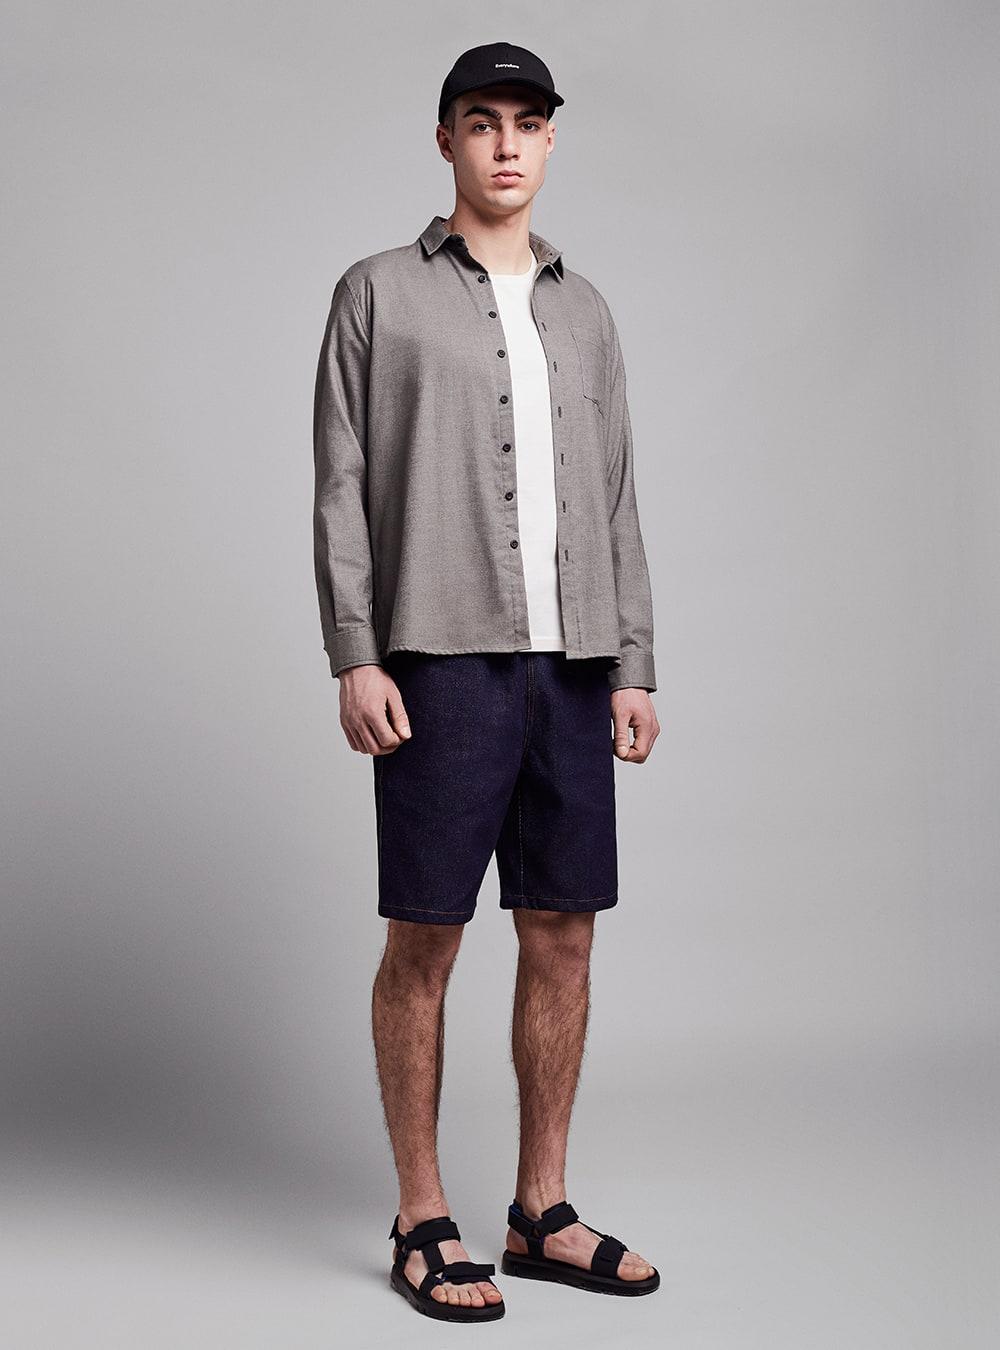 Drawstring shorts (dark denim) in cotton, made in Portugal by wetheknot.